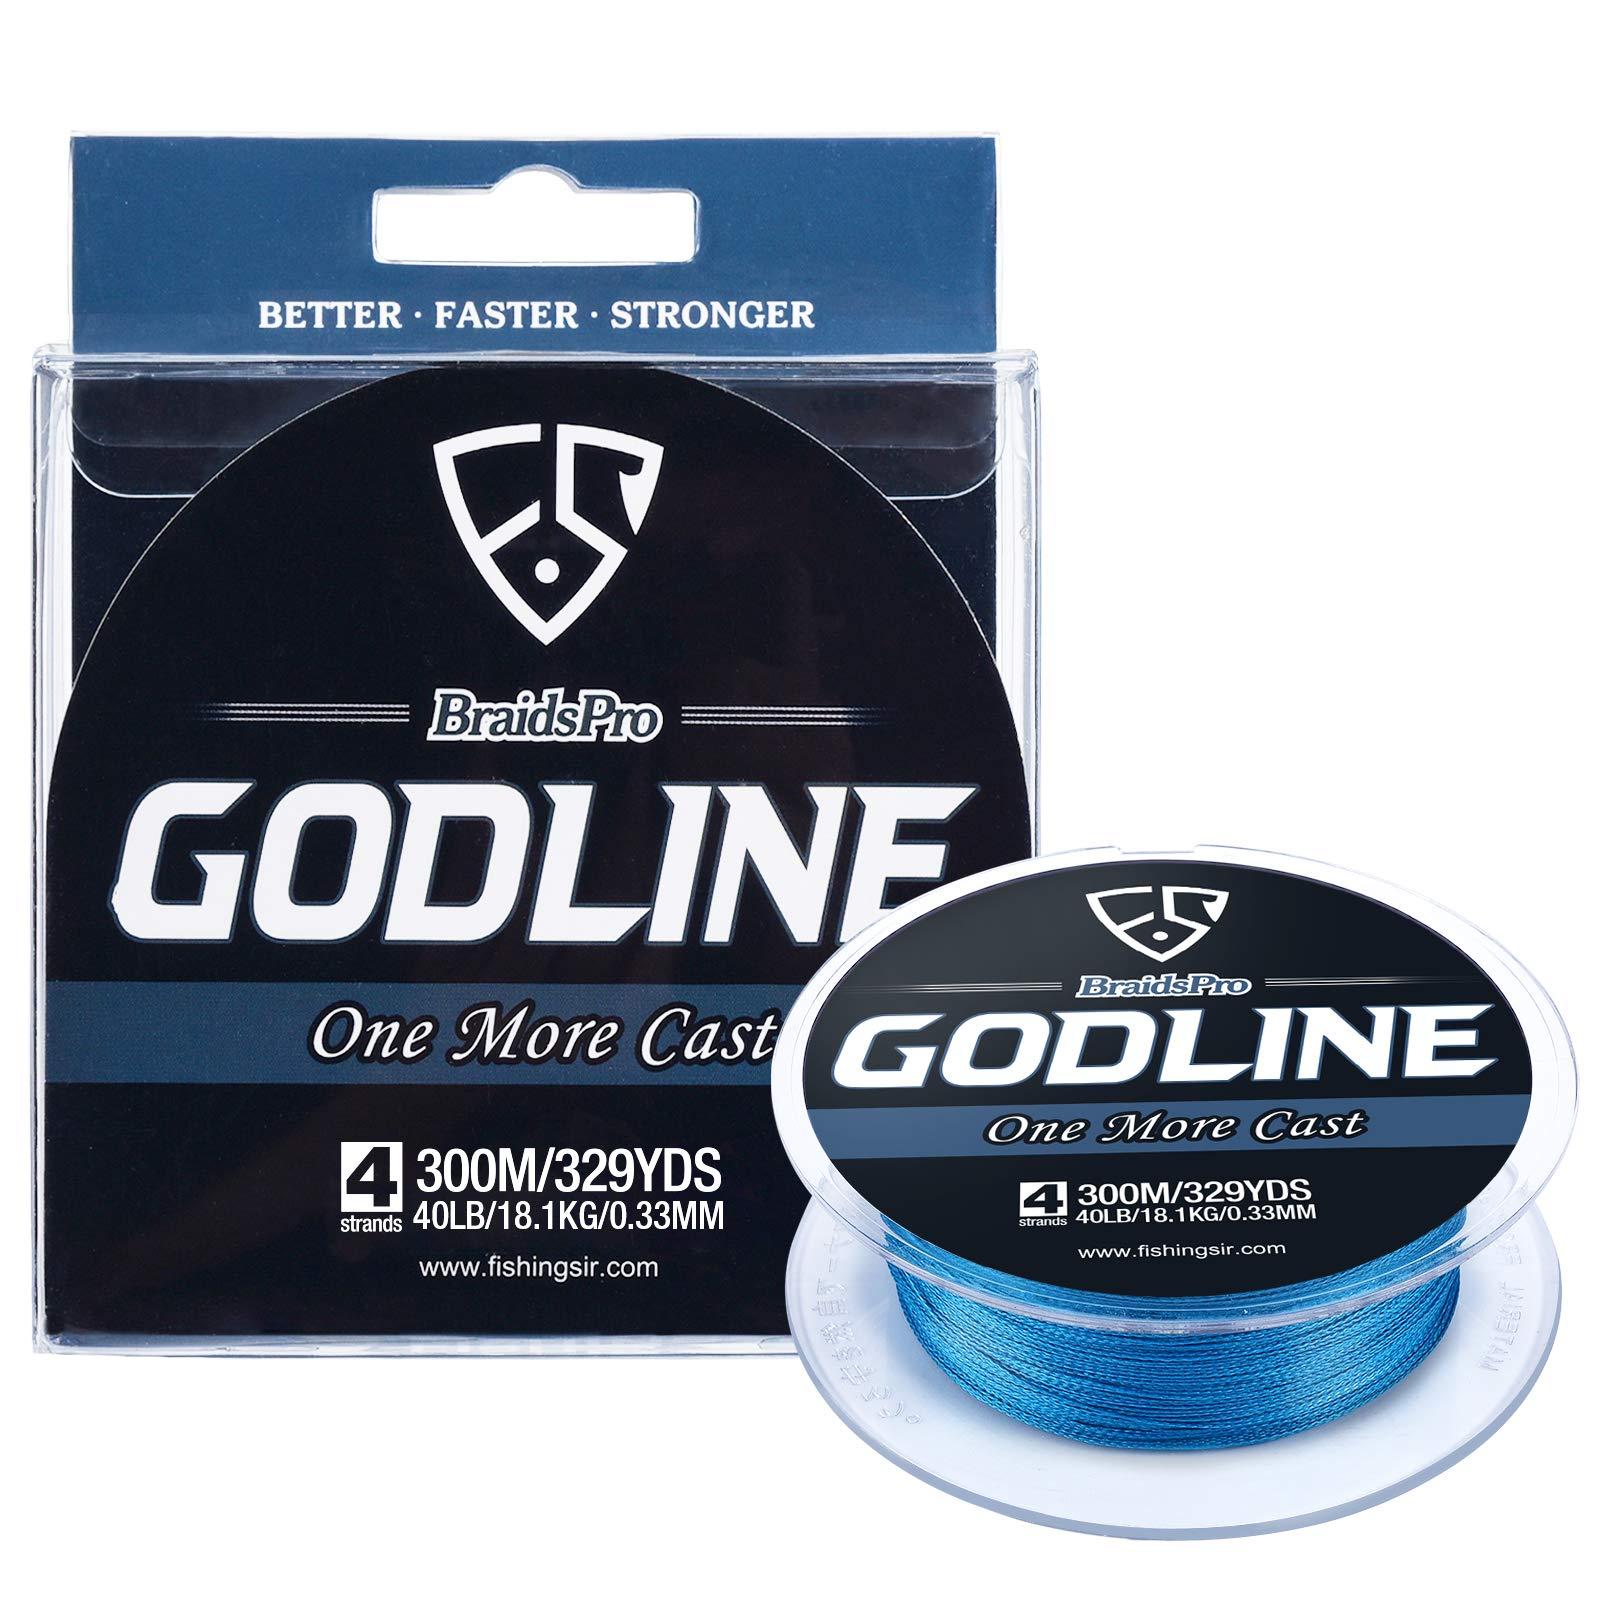 FISHINGSIR GODLINE Braided Fishing Line - Super Power Braid Lines - Abrasion Resistant Superline, 150-1094 Yds, 8-120LB